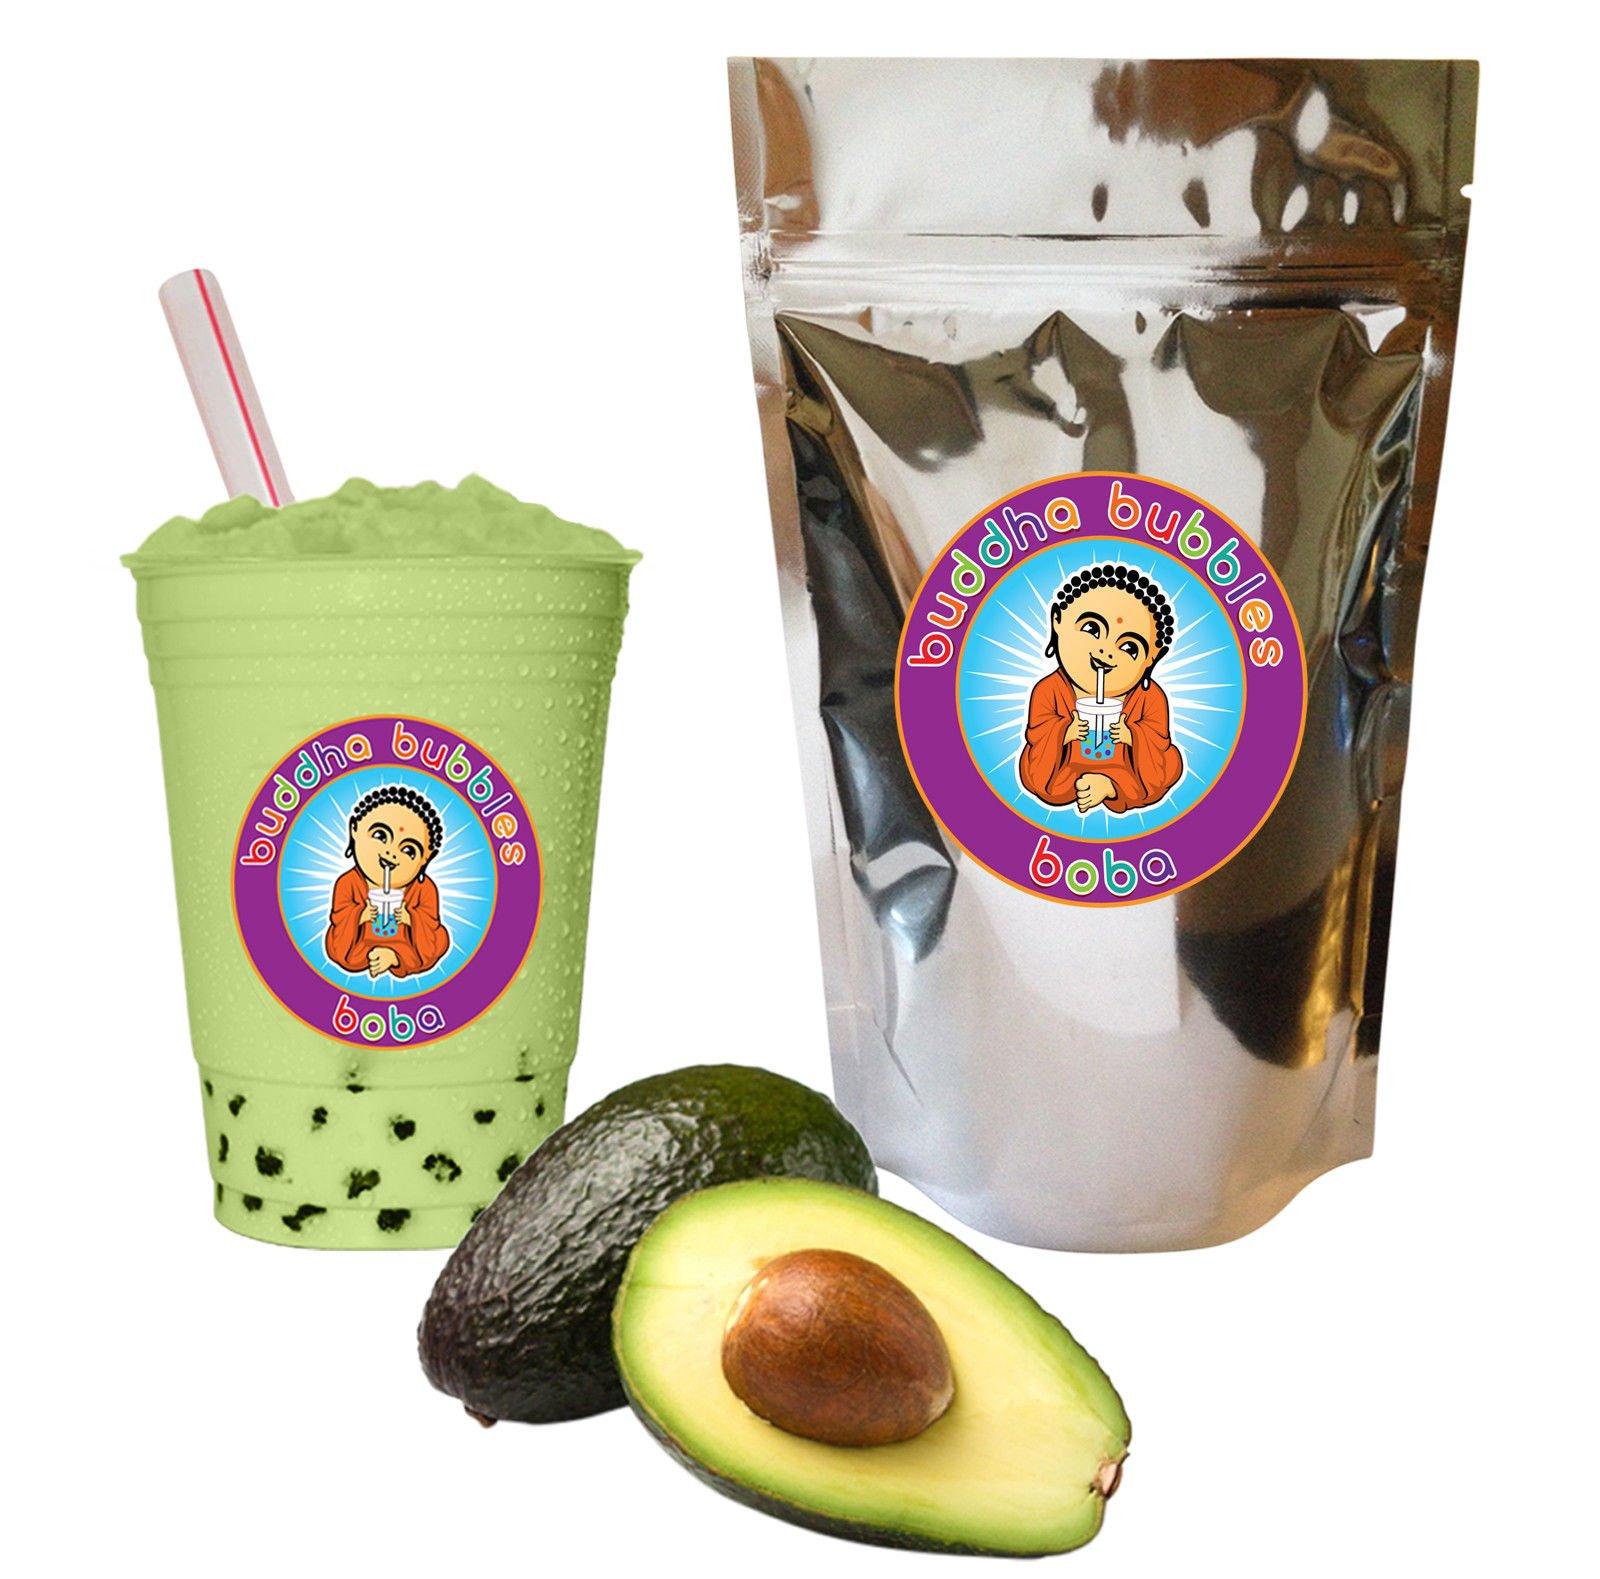 Avocado Bubble Boba Tea Drink Mix Powder Buddha Bubbles Boba 1 Kilo (2.2 Pounds) | (1000 Grams) by Buddha Bubbles Boba